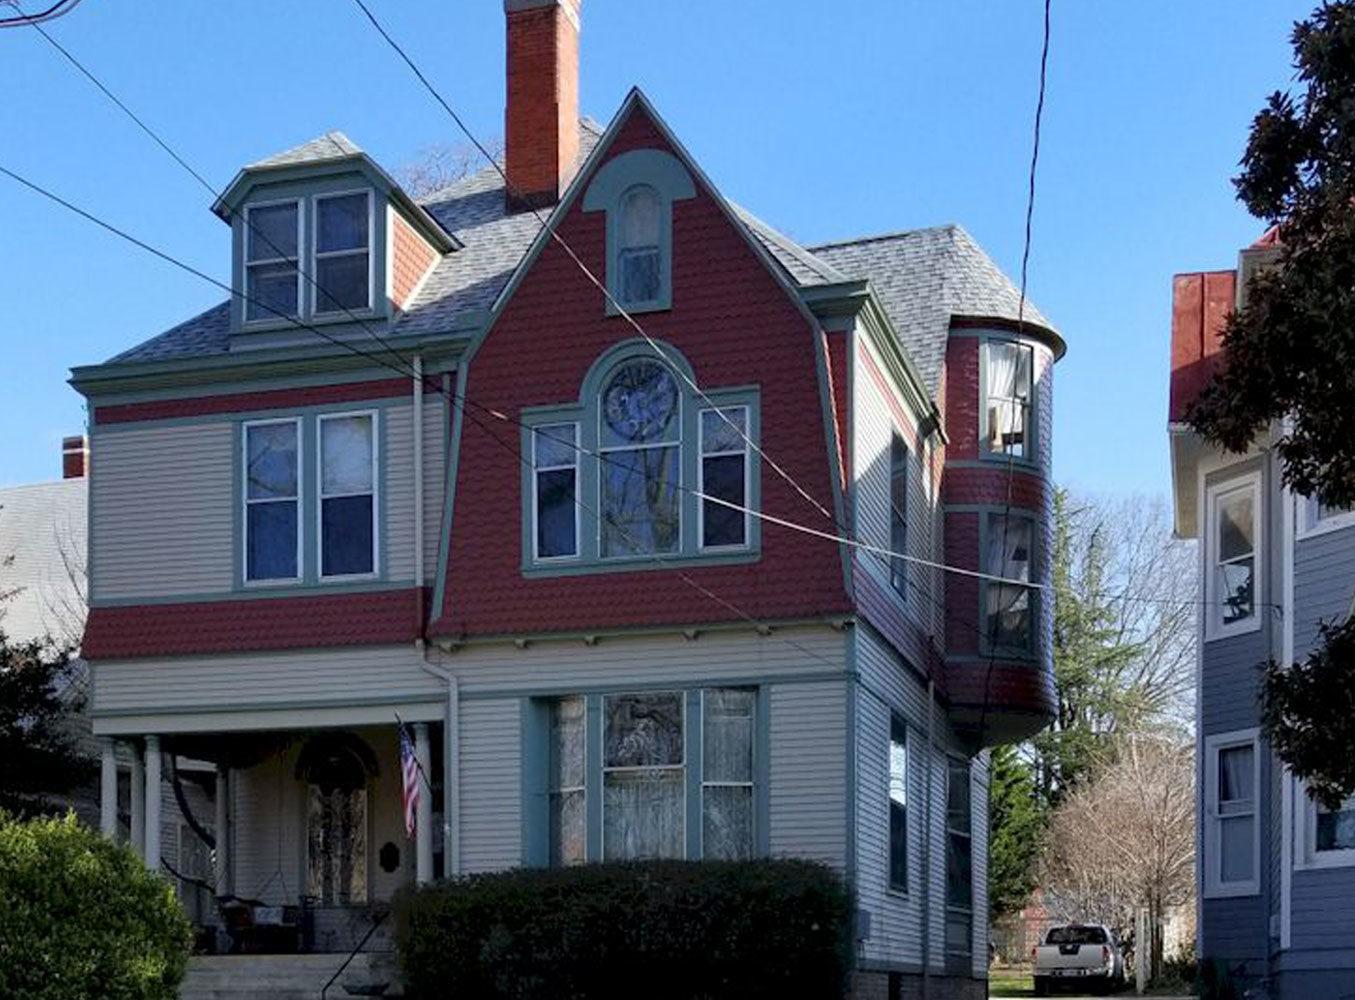 The Judkins House